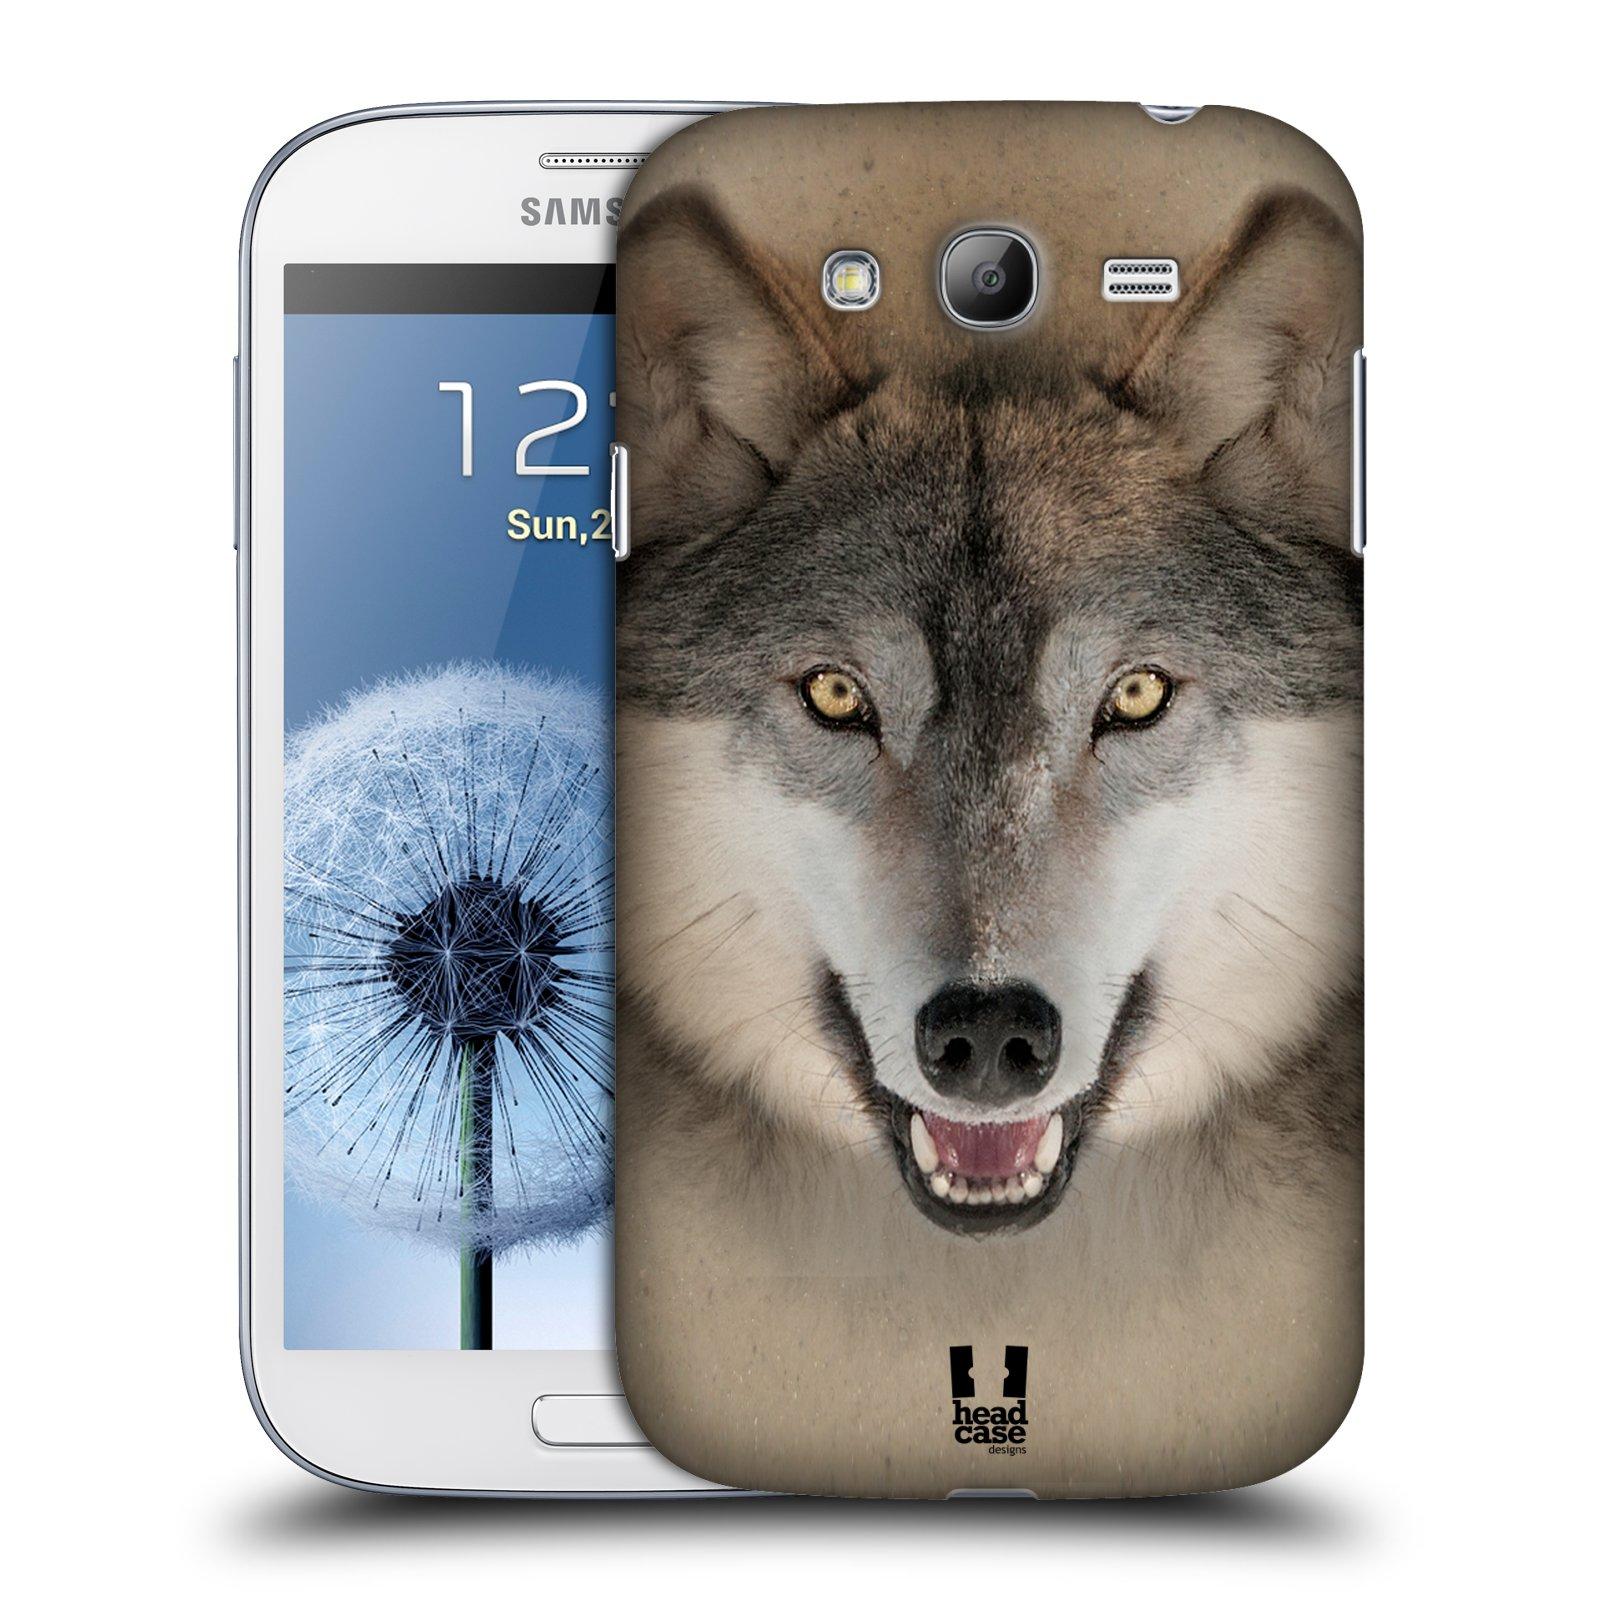 HEAD CASE plastový obal na mobil SAMSUNG GALAXY Grand i9080 vzor Zvířecí tváře 2 vlk šedý